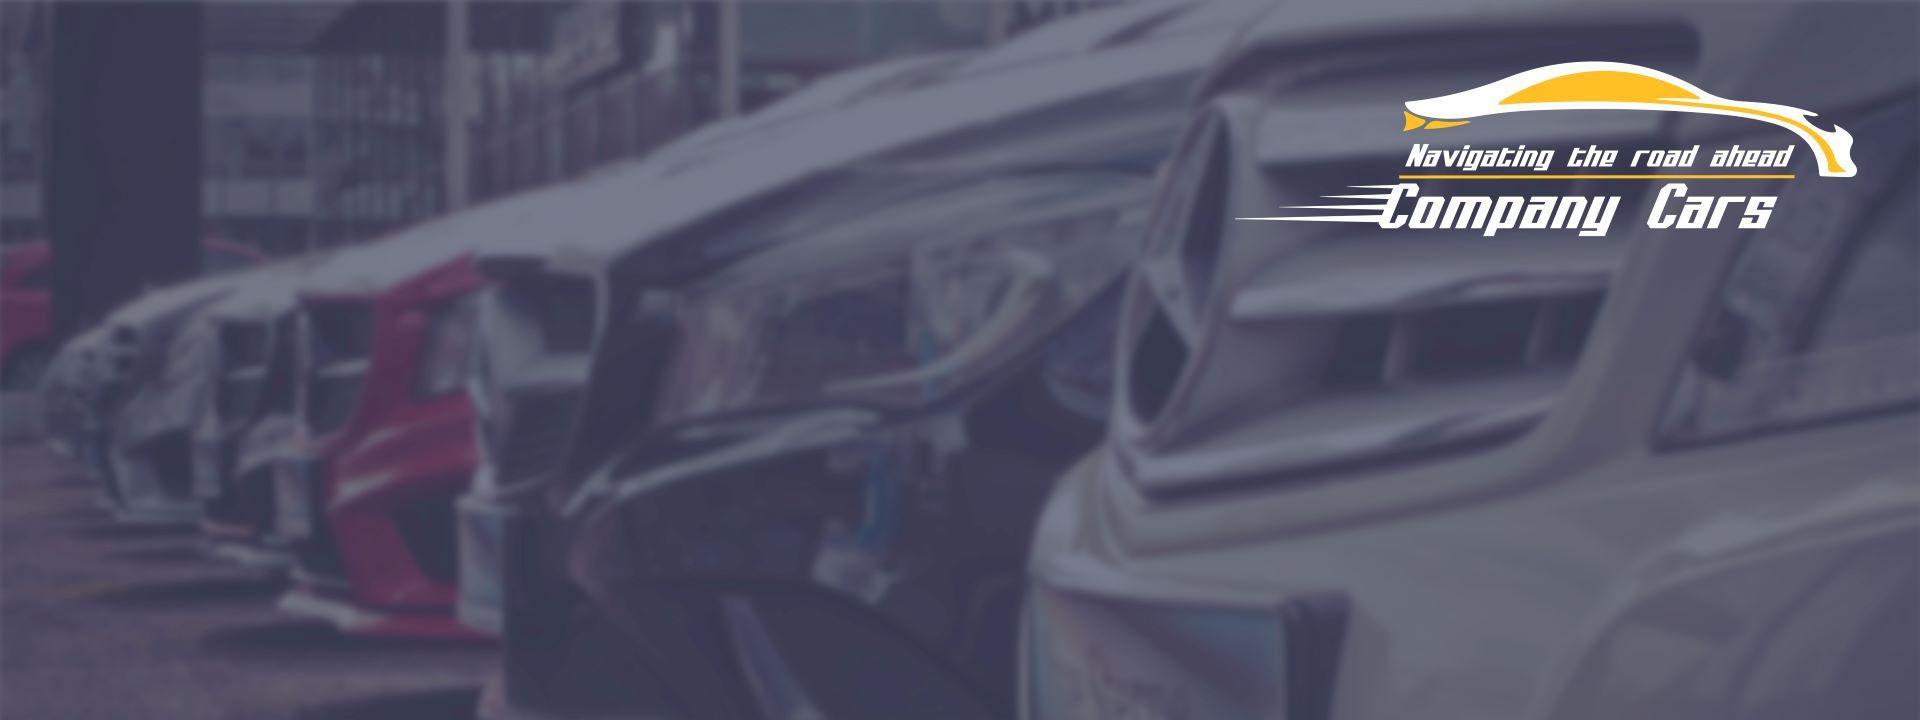 Navigating the road ahead: Company Cars